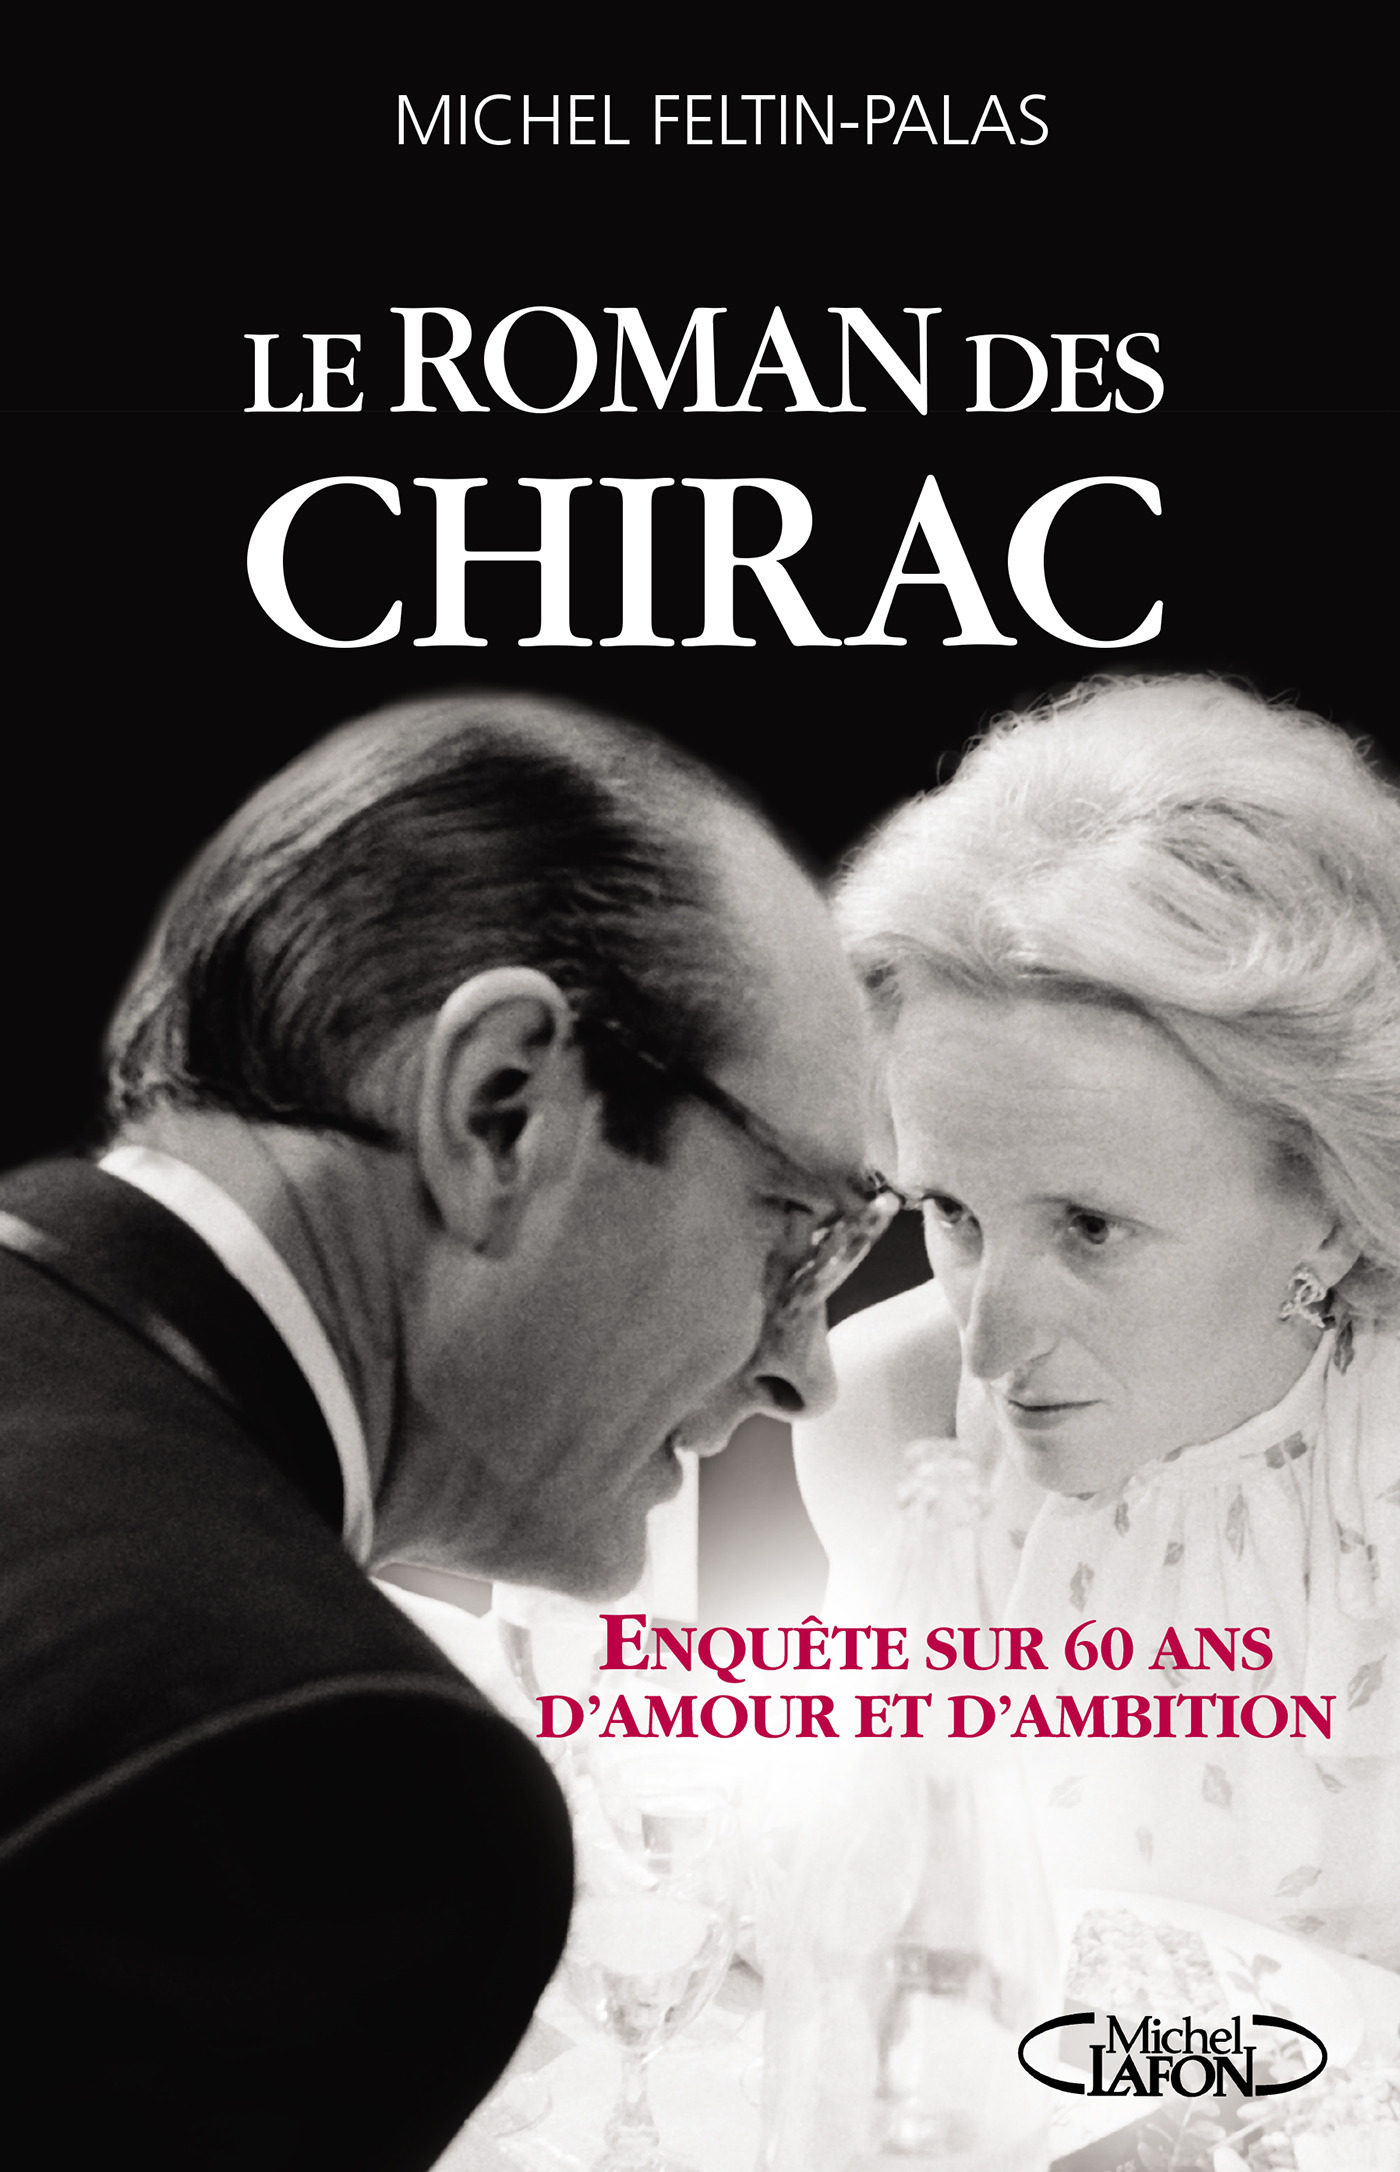 Le Roman Des Chirac Ebook Michel Feltin Palas Descargar Libro